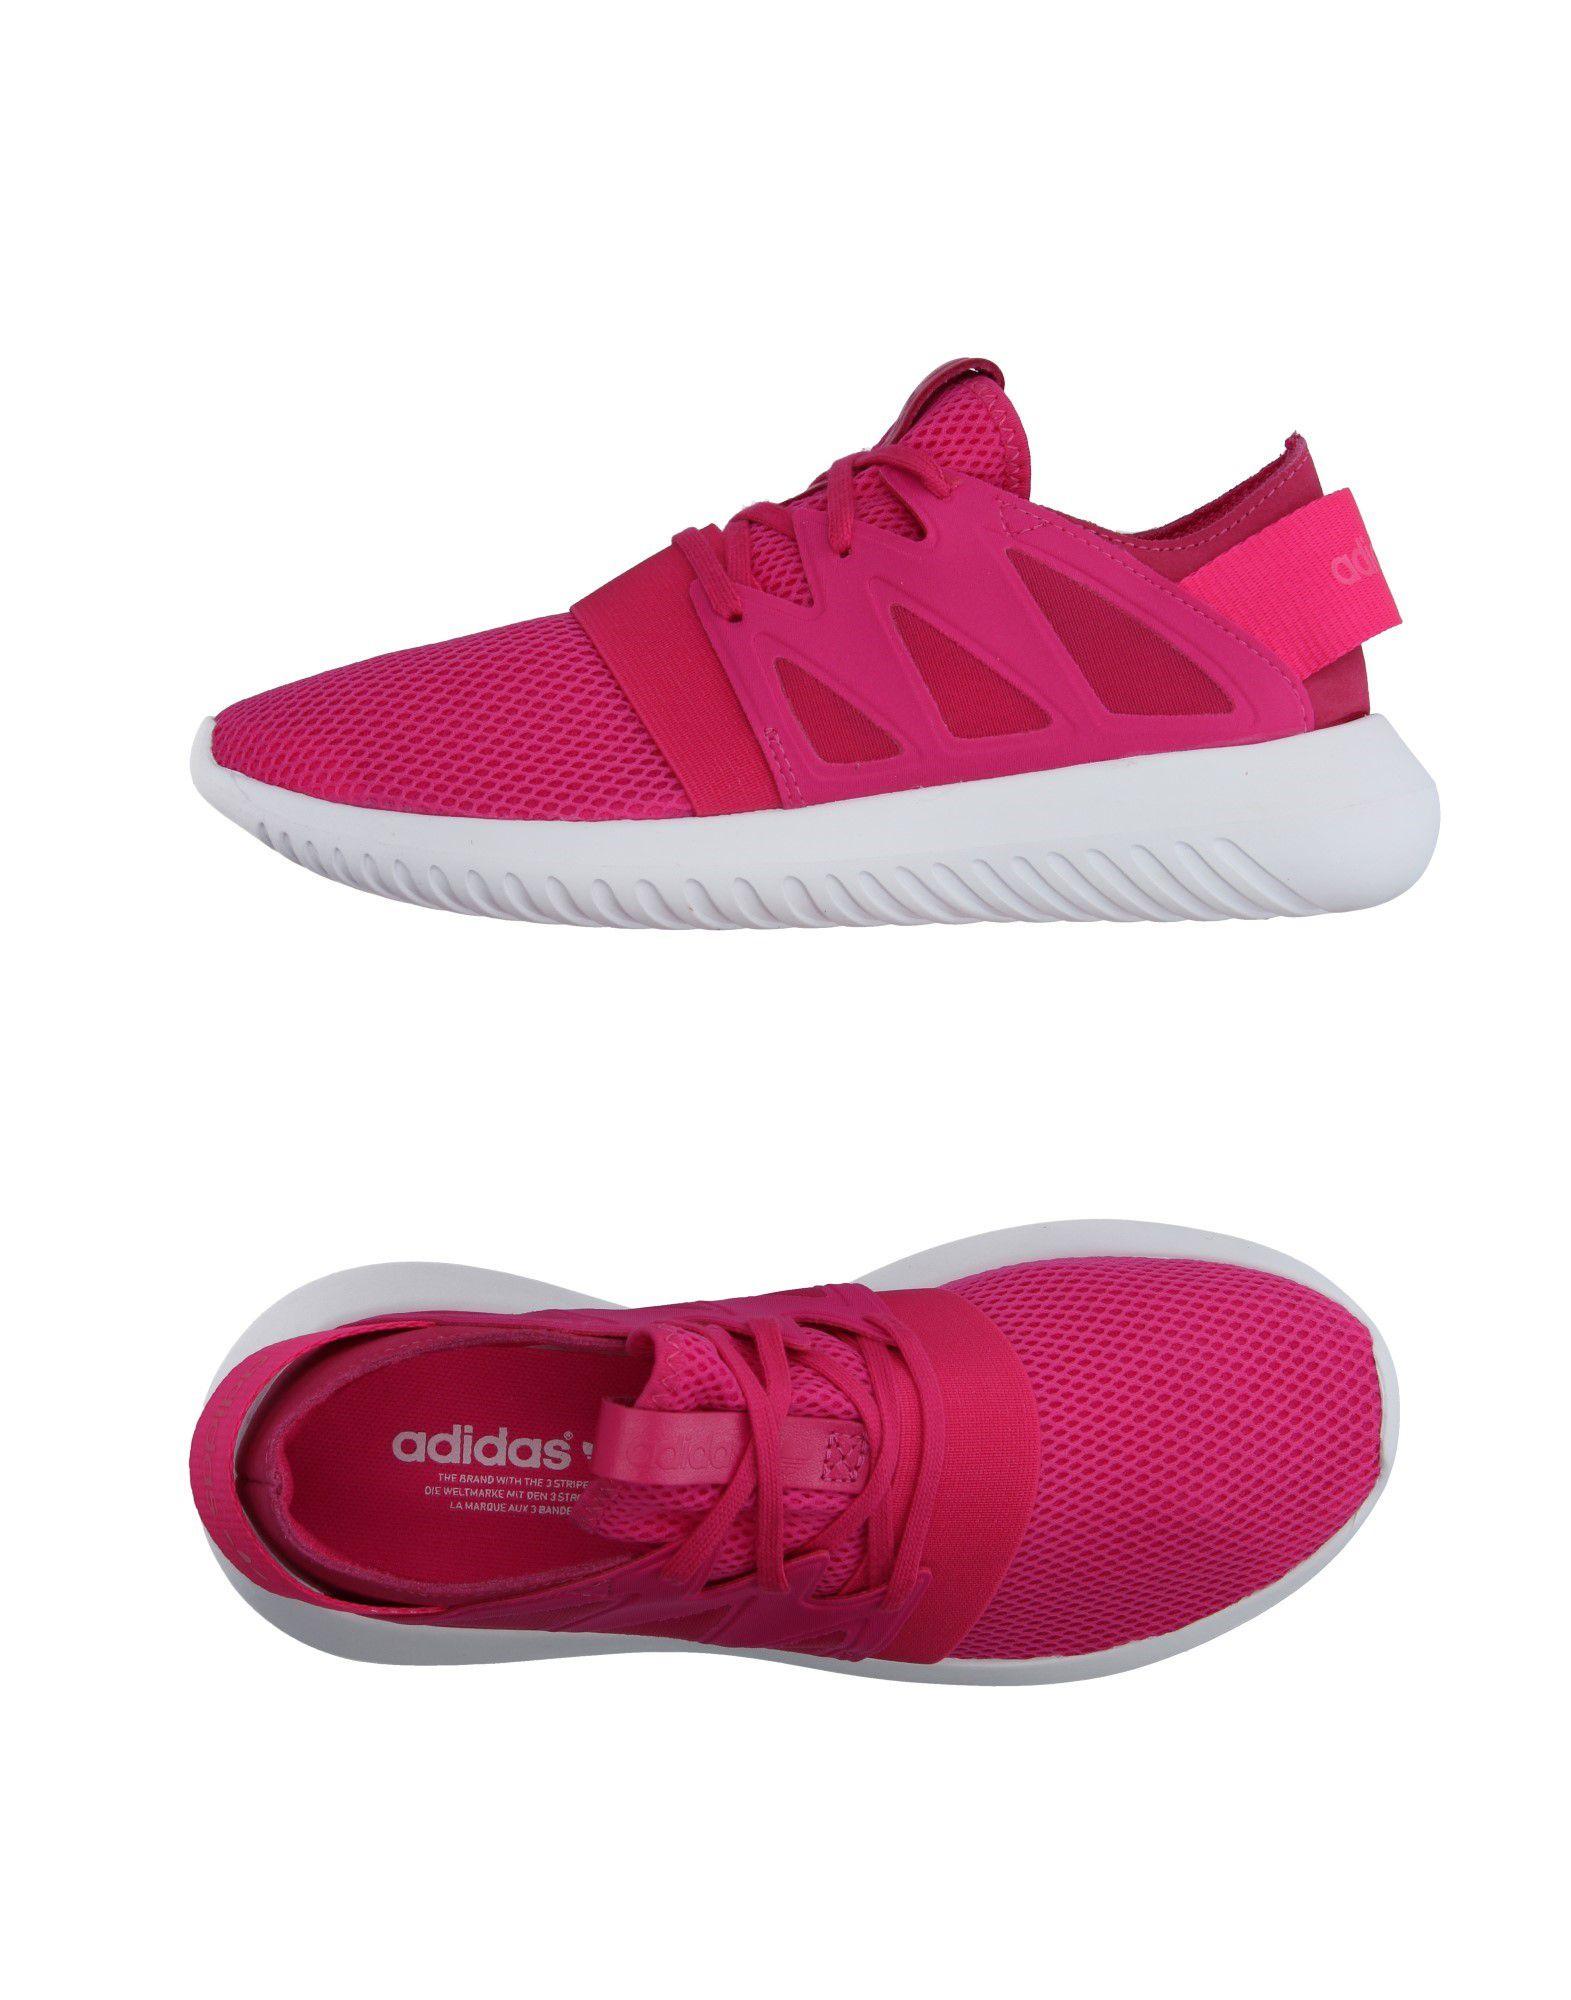 Adidas Originals Sneakers Qualität Damen  11094738QO Gute Qualität Sneakers beliebte Schuhe 32034b